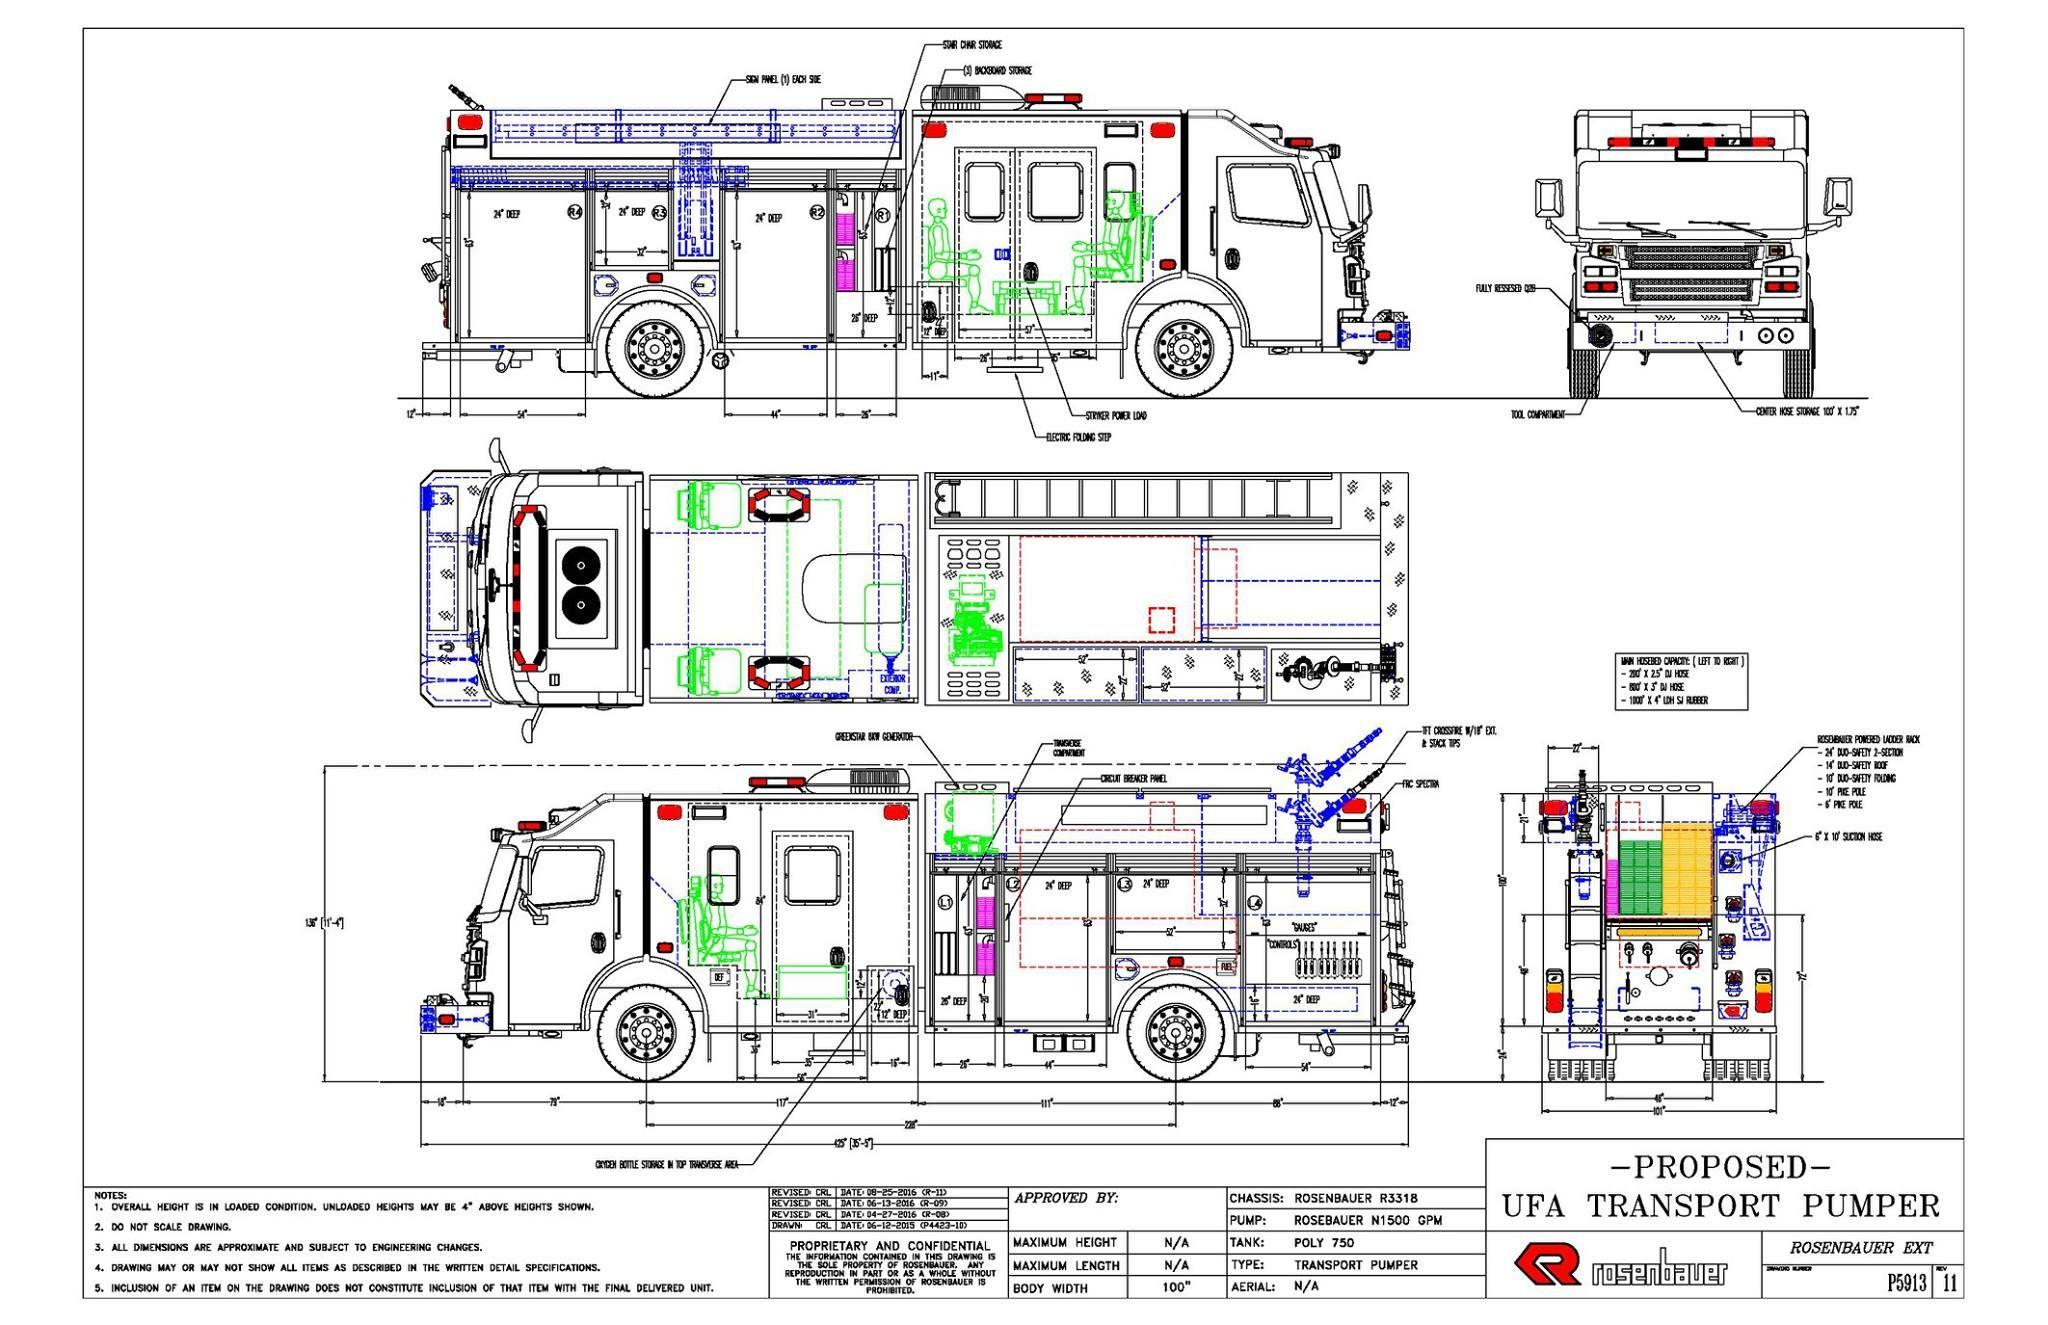 unified fire authority rosenbauer fire engine drawing fire engine fire trucks firefighter fire [ 2048 x 1325 Pixel ]